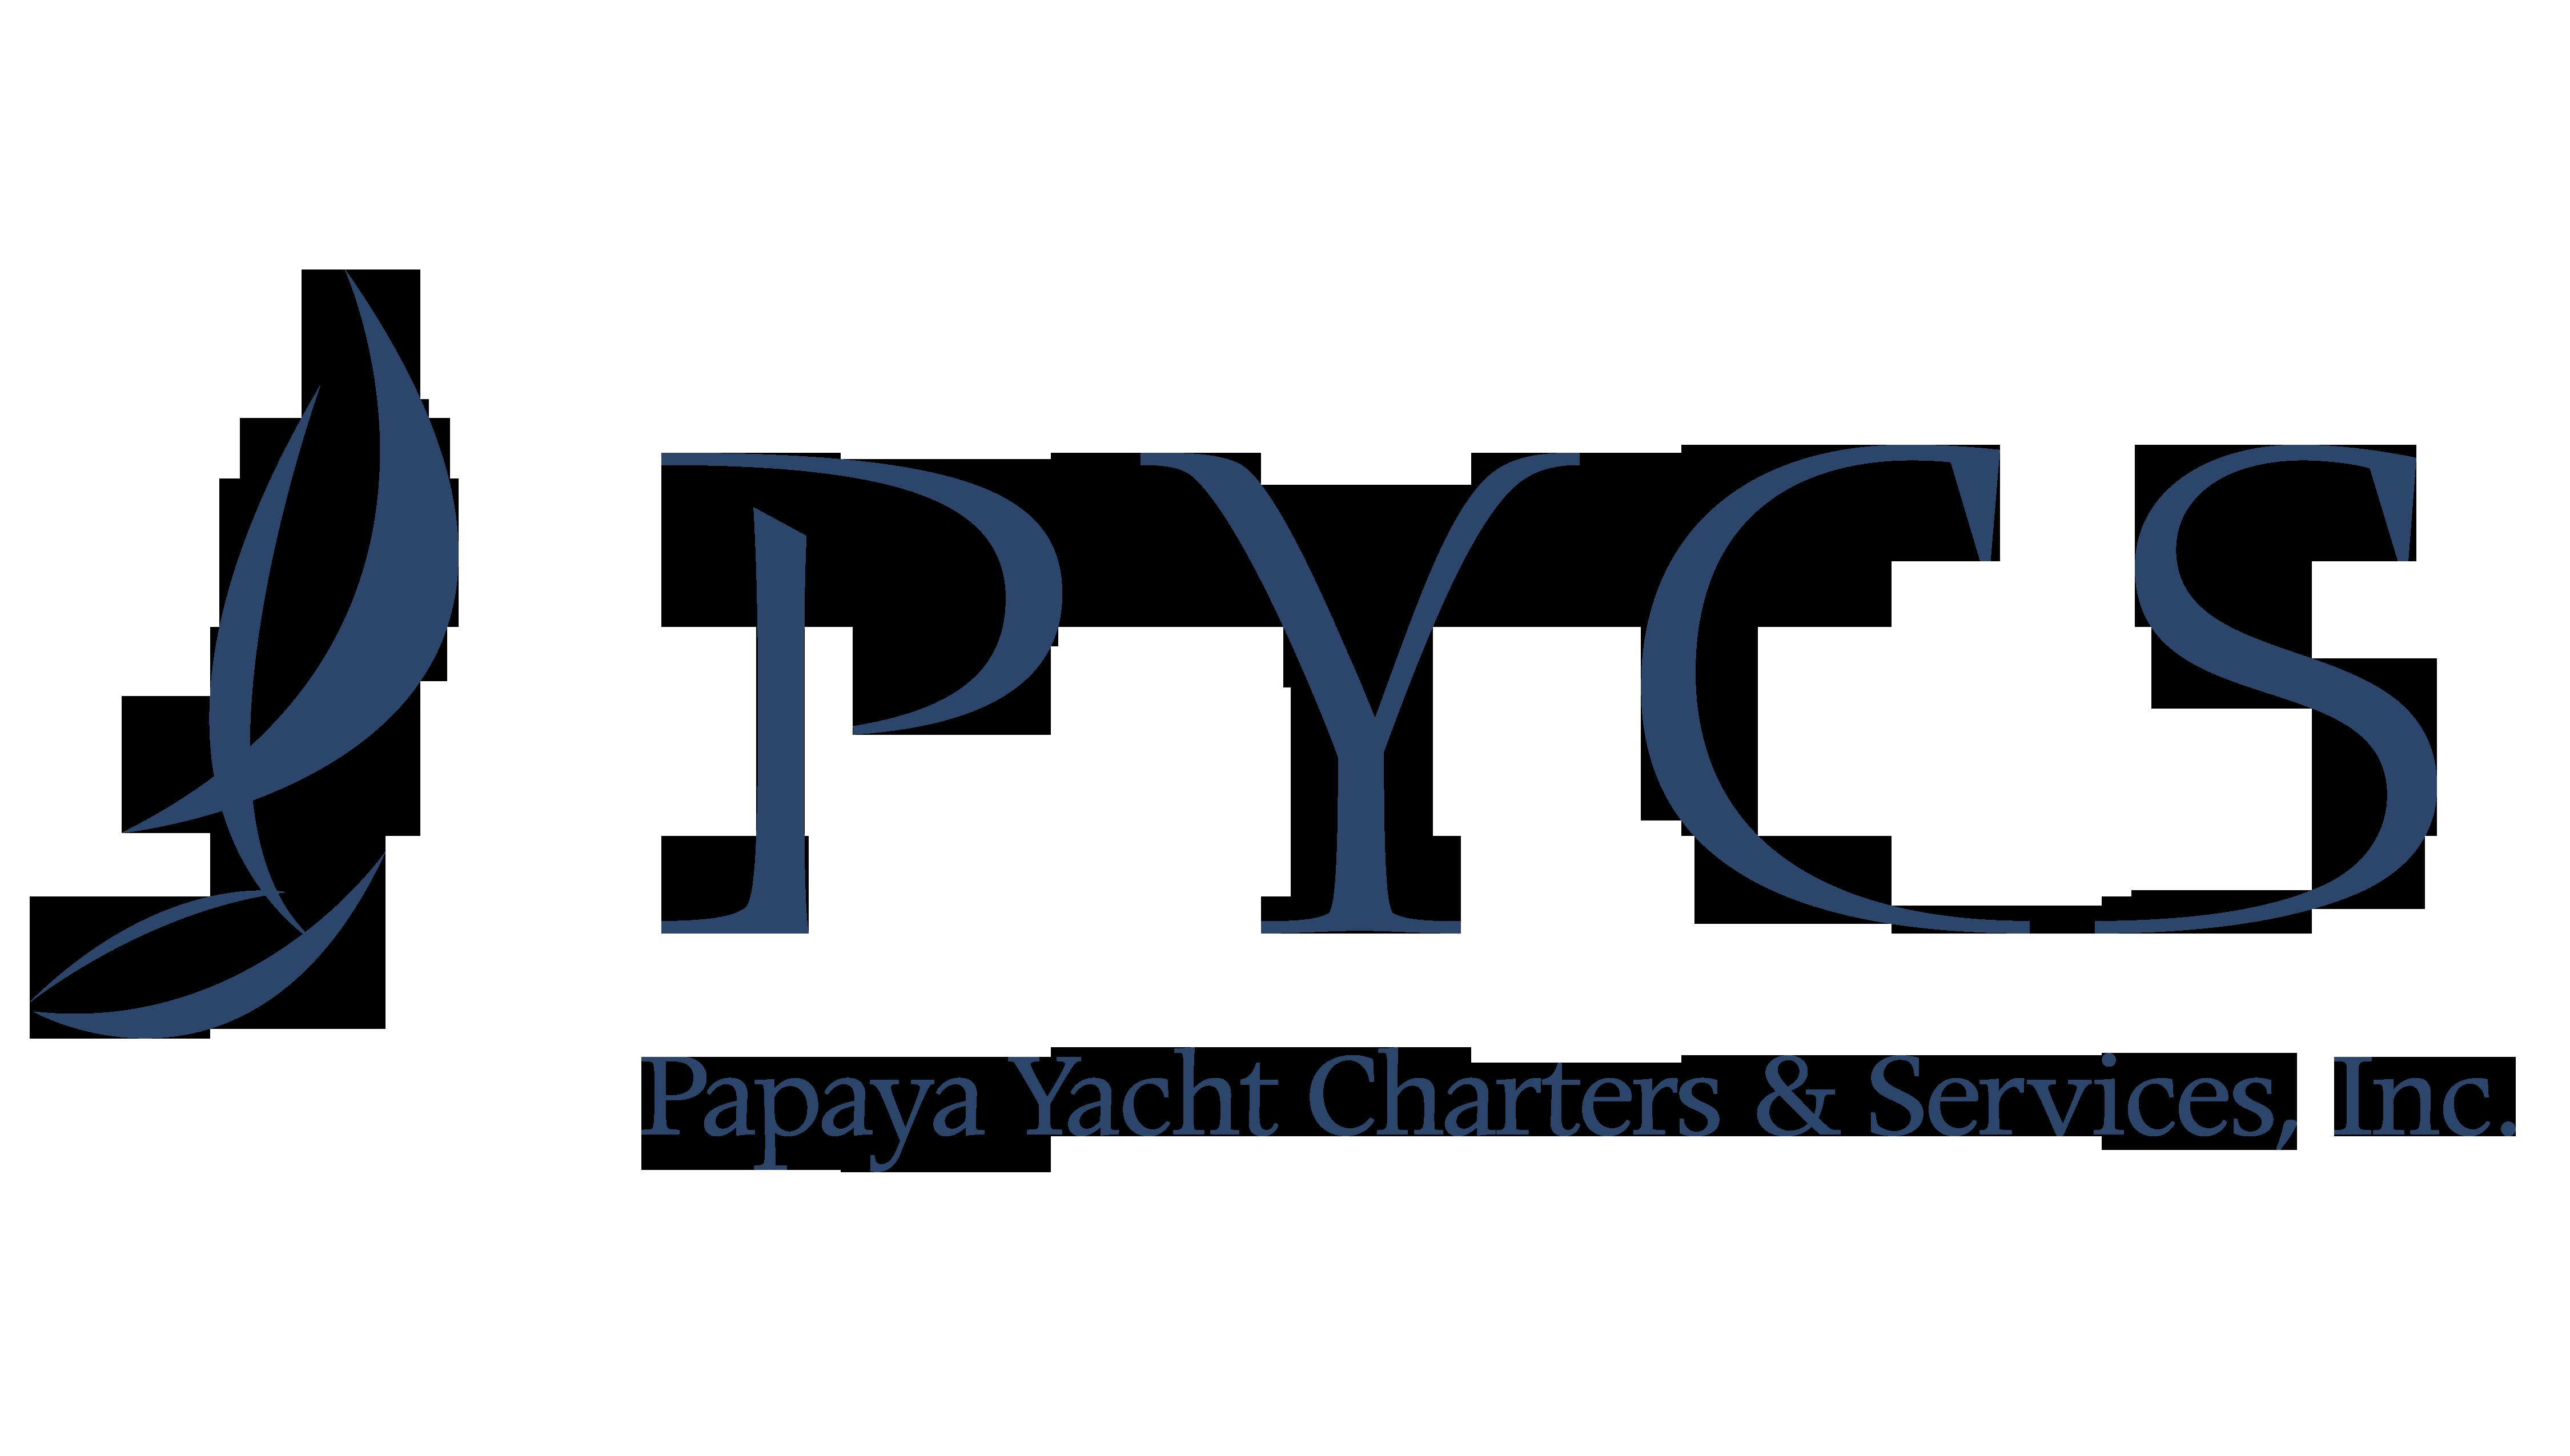 PYCSI | Papaya Yacht Charters and Services, Inc.